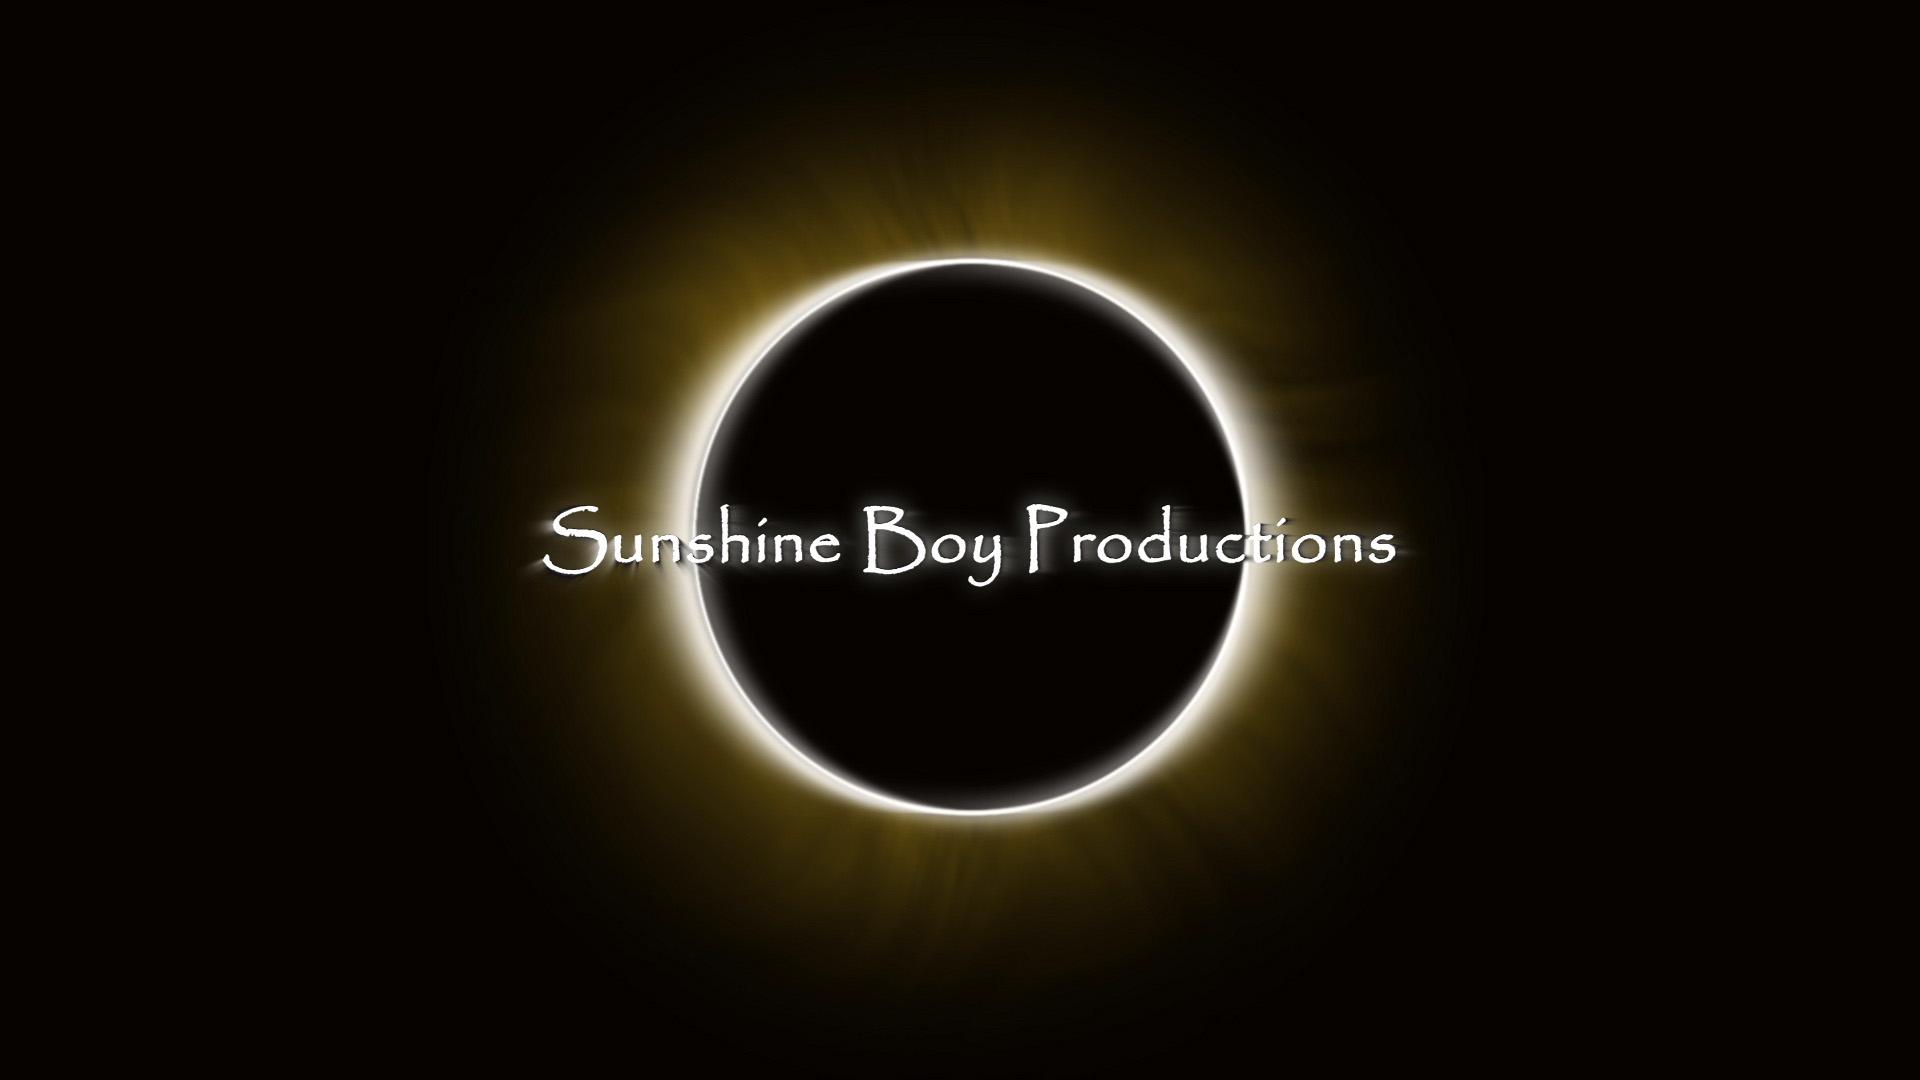 Sunshine Boy Productions